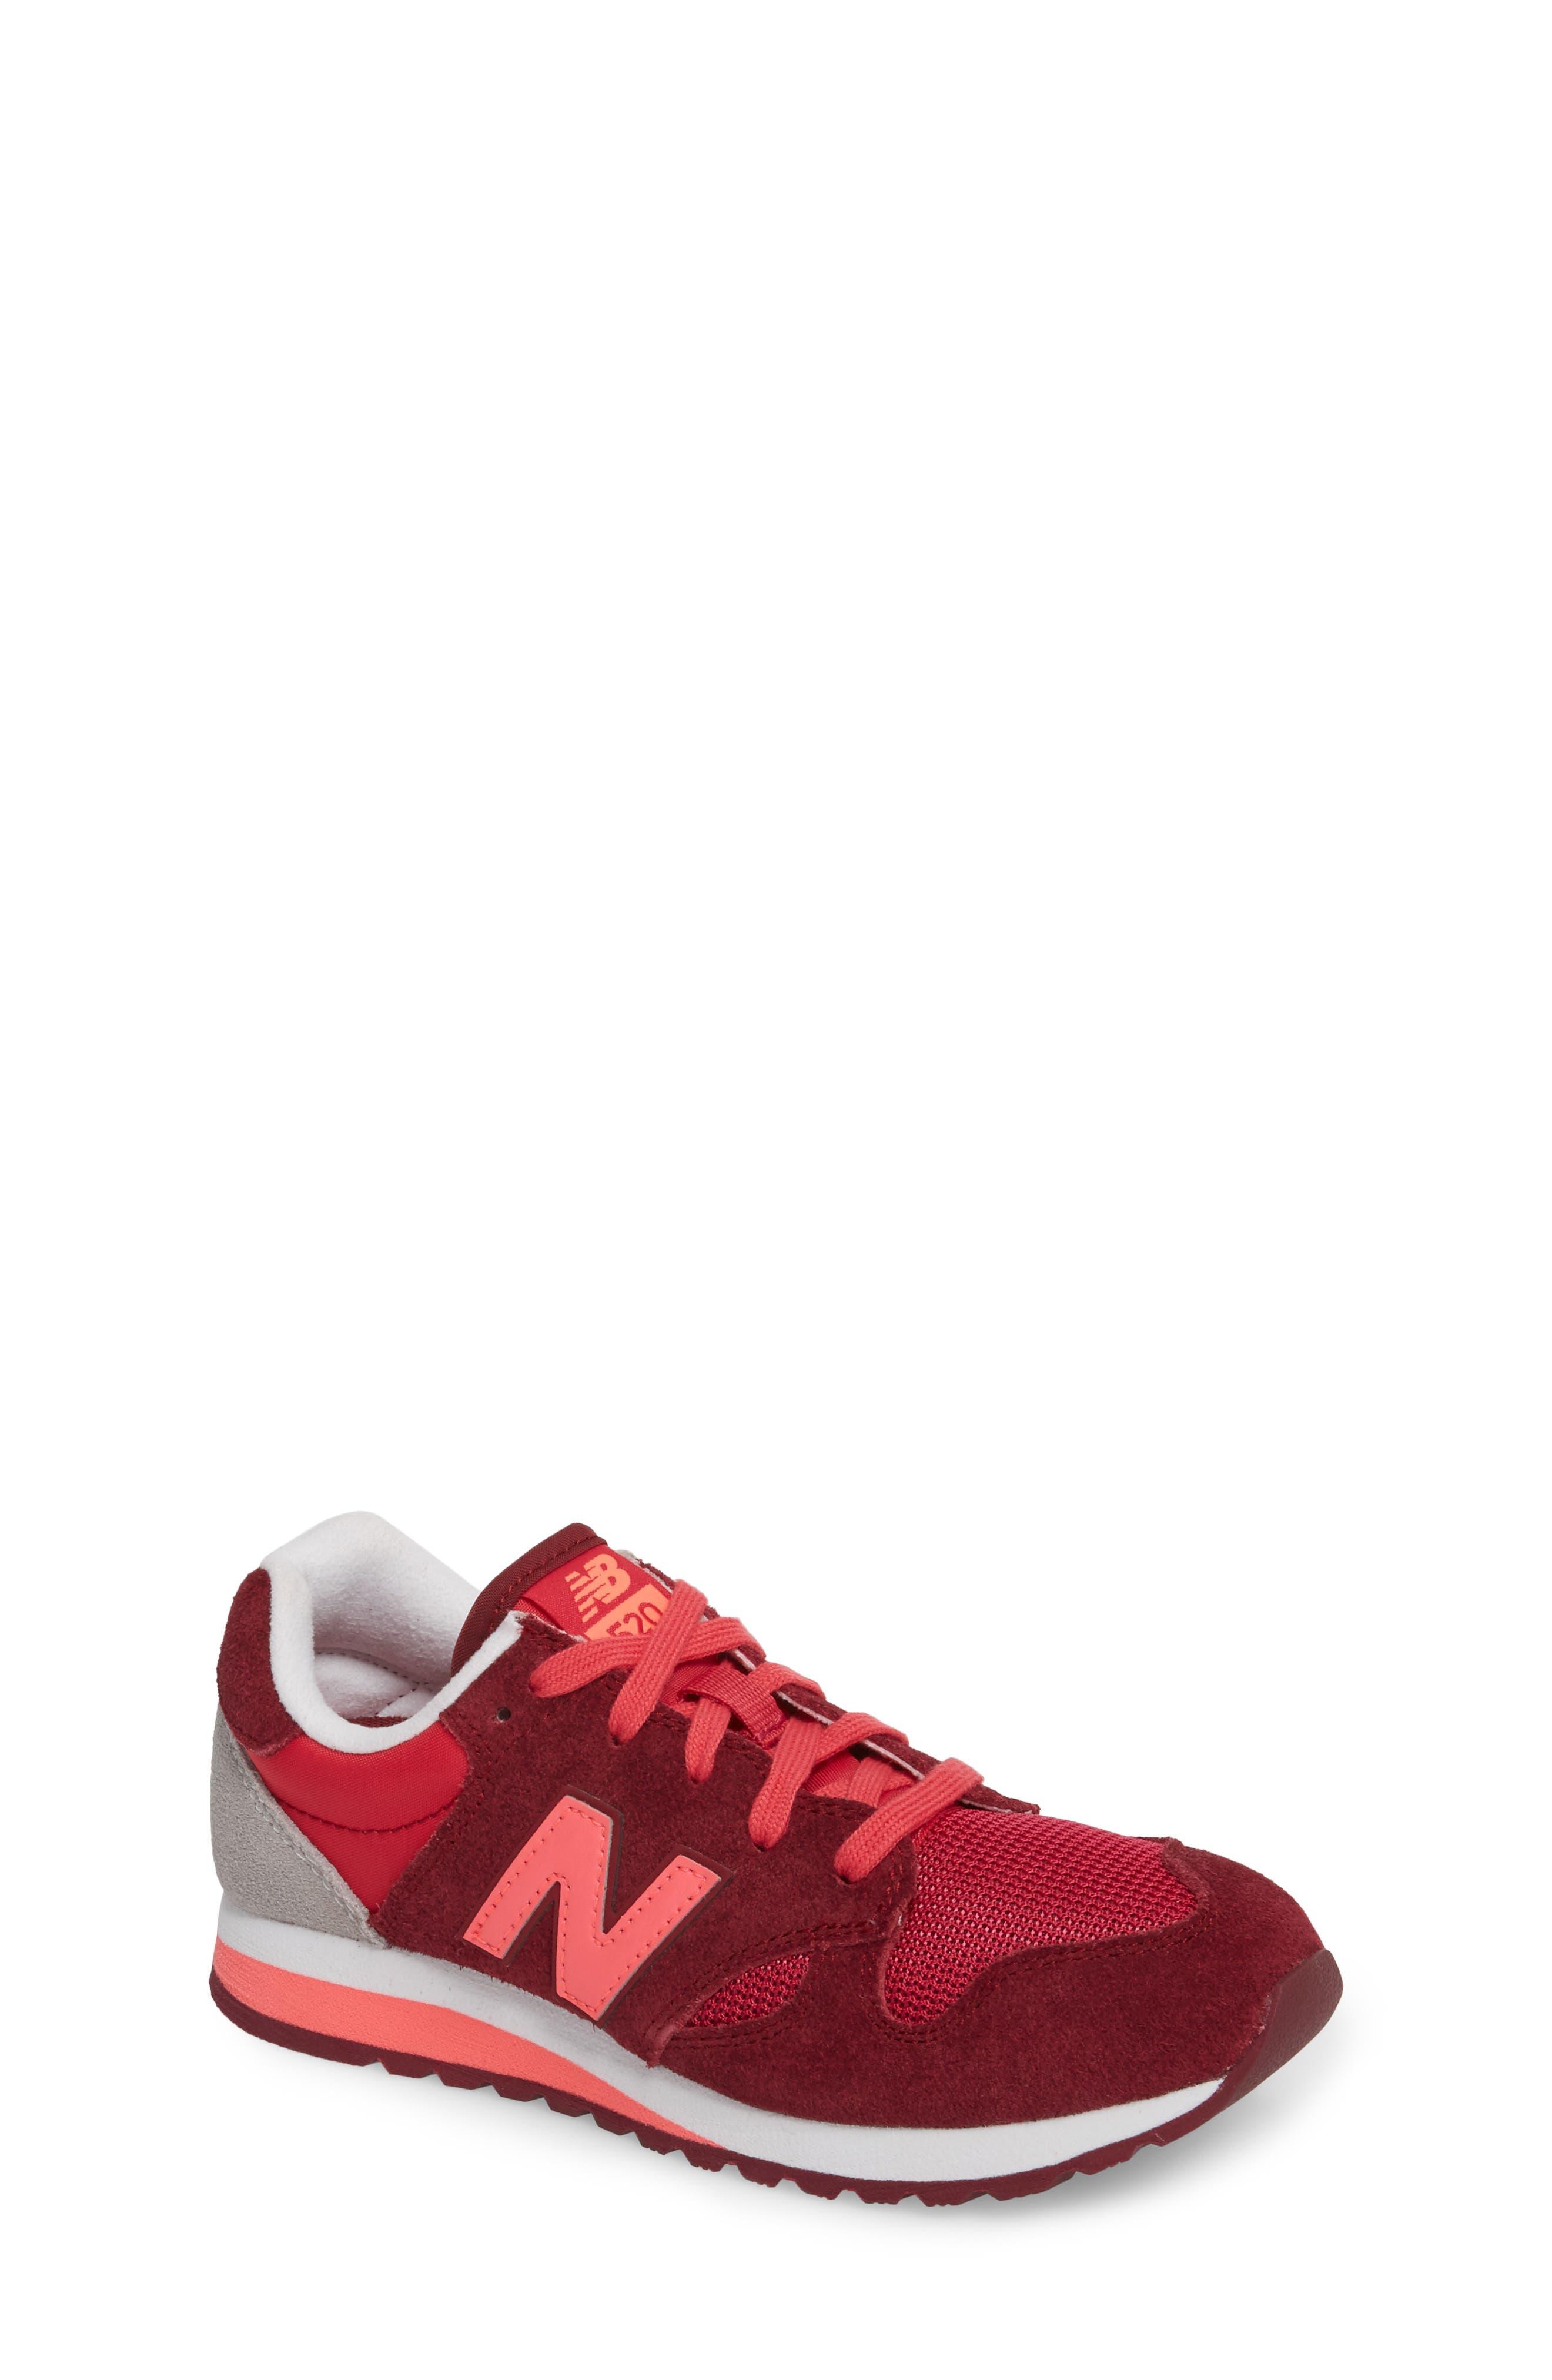 520 Sneaker,                             Main thumbnail 1, color,                             655